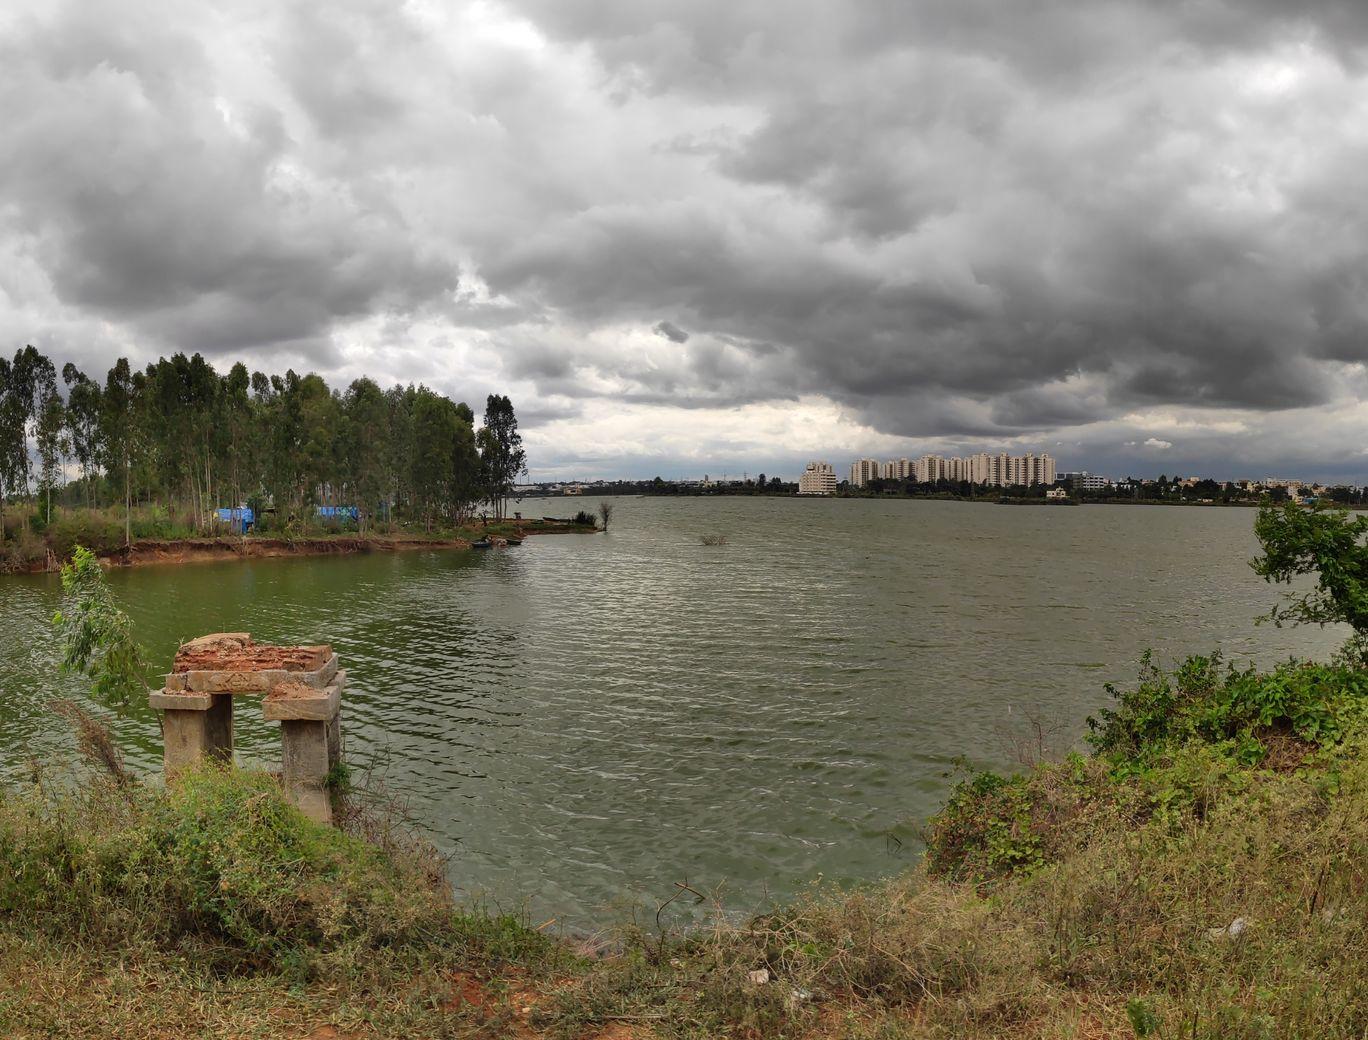 Photo of Hennagara Lake By Kiran Kumar